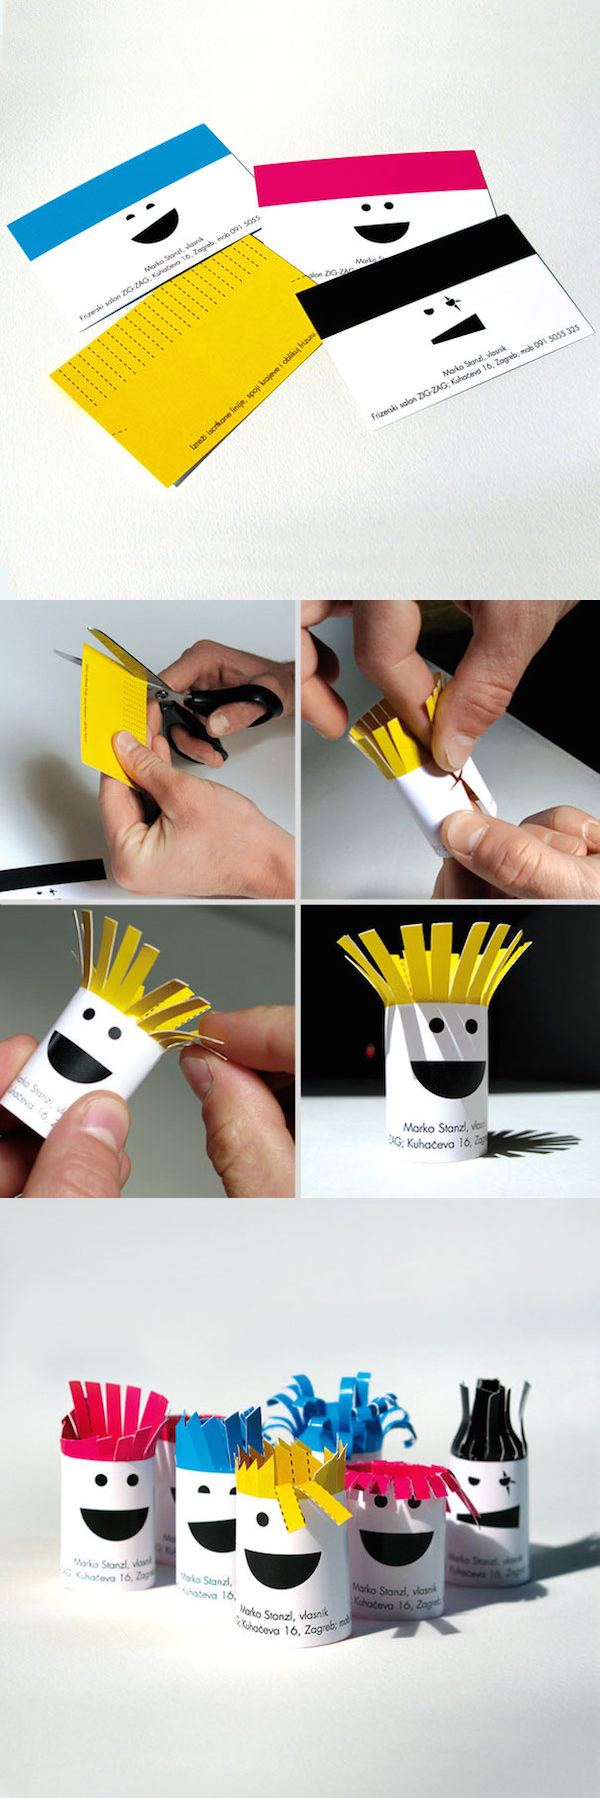 Creative Unique Business Card Design Inspiration - 19